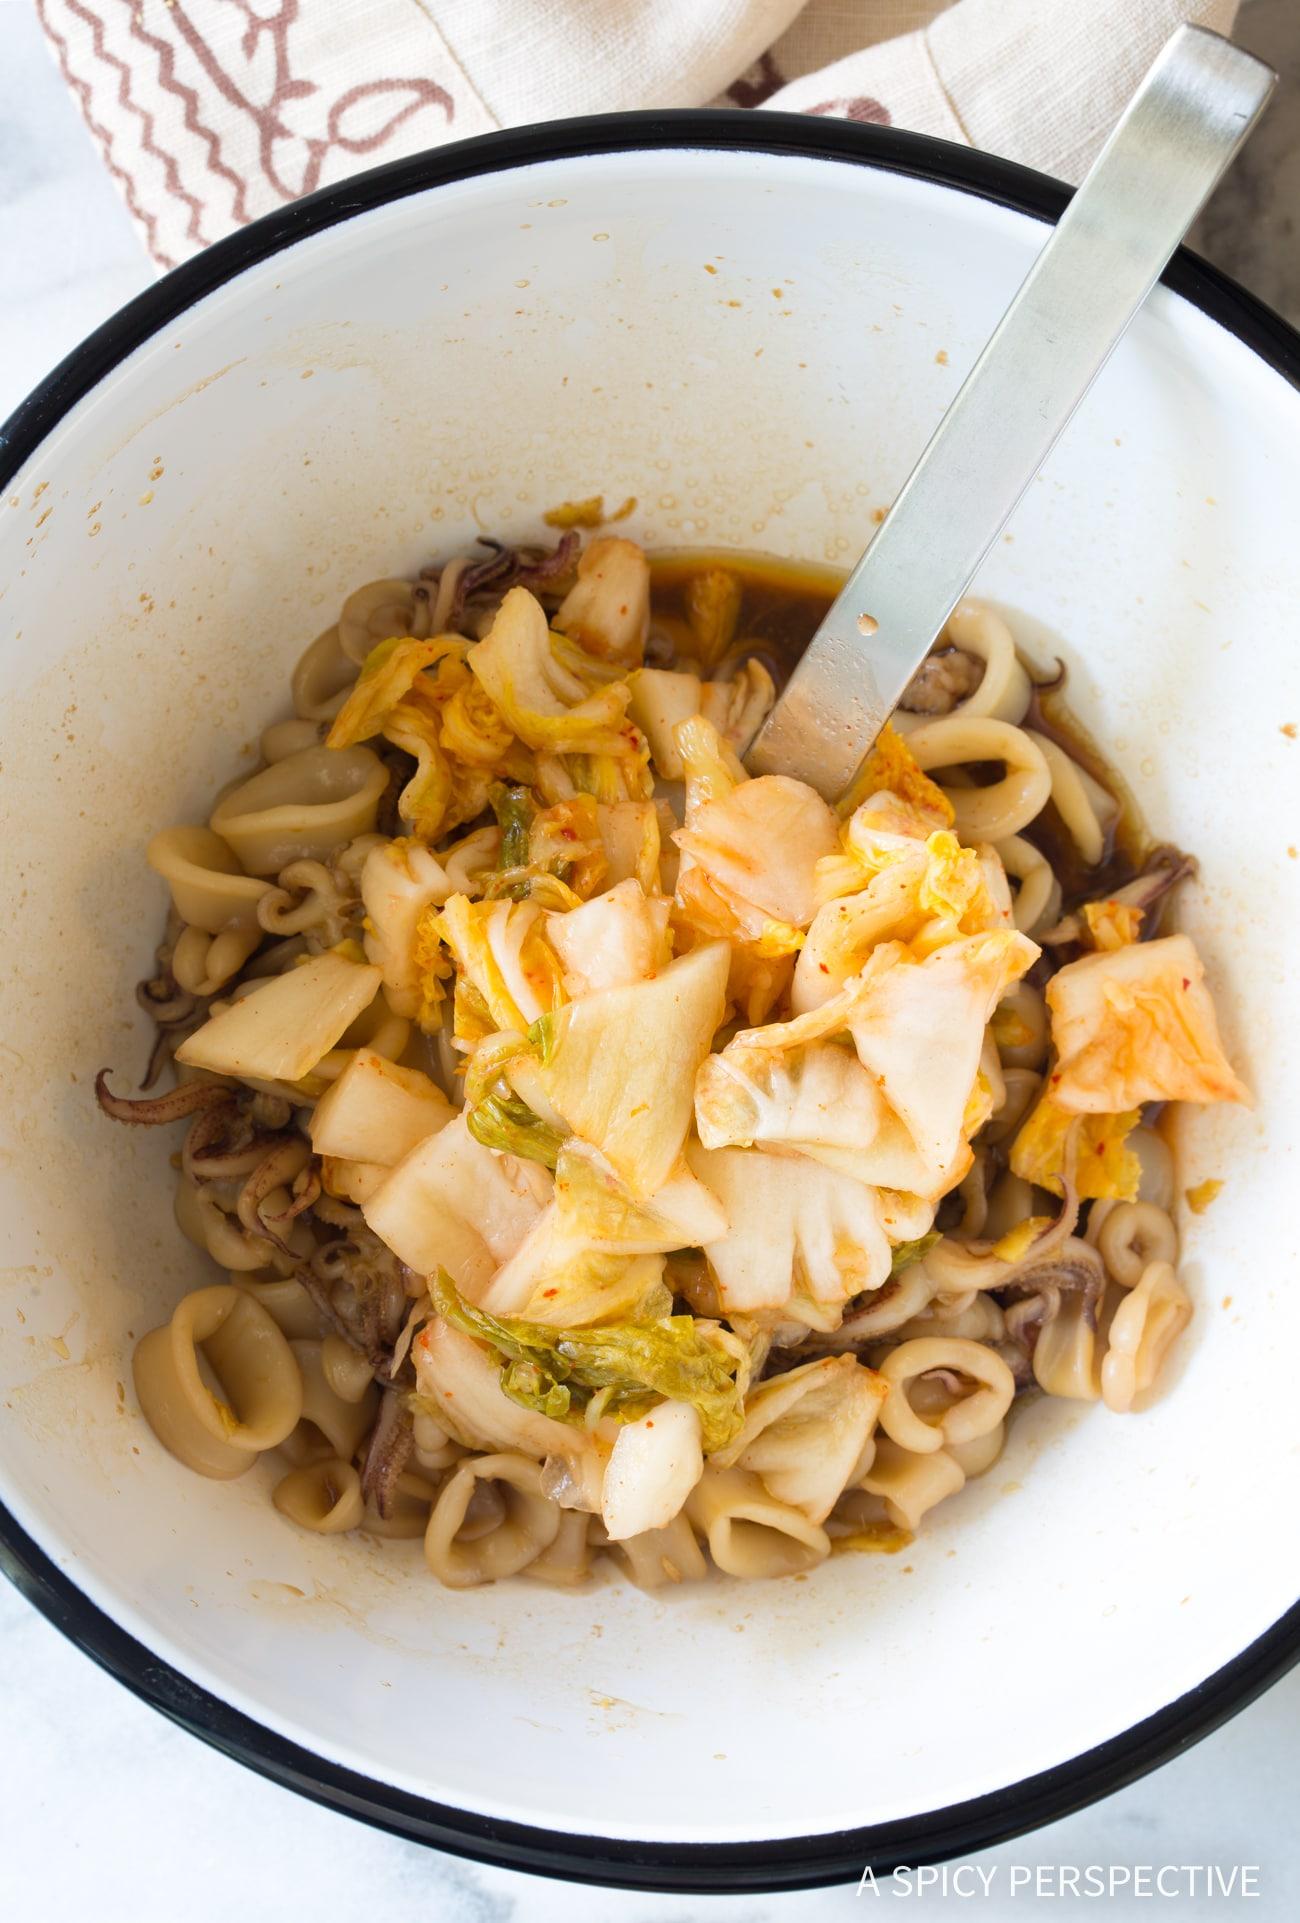 How To: Hawaiian Tako Poke Recipe (Octopus or Squid!)